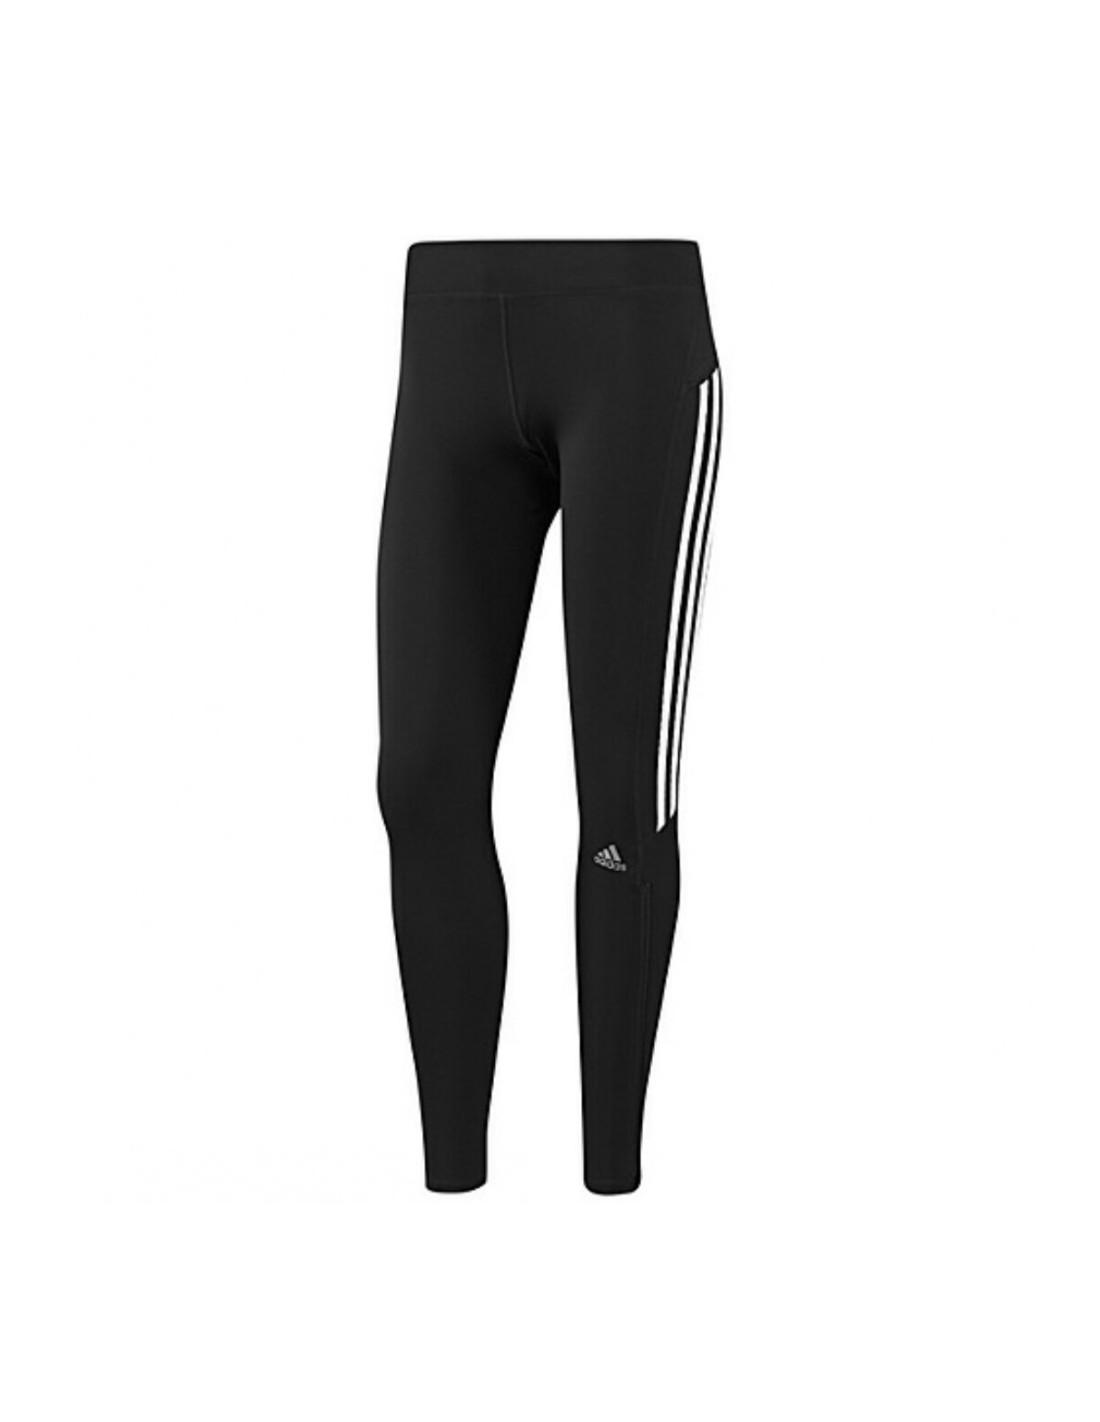 pantaloni adidas running donna